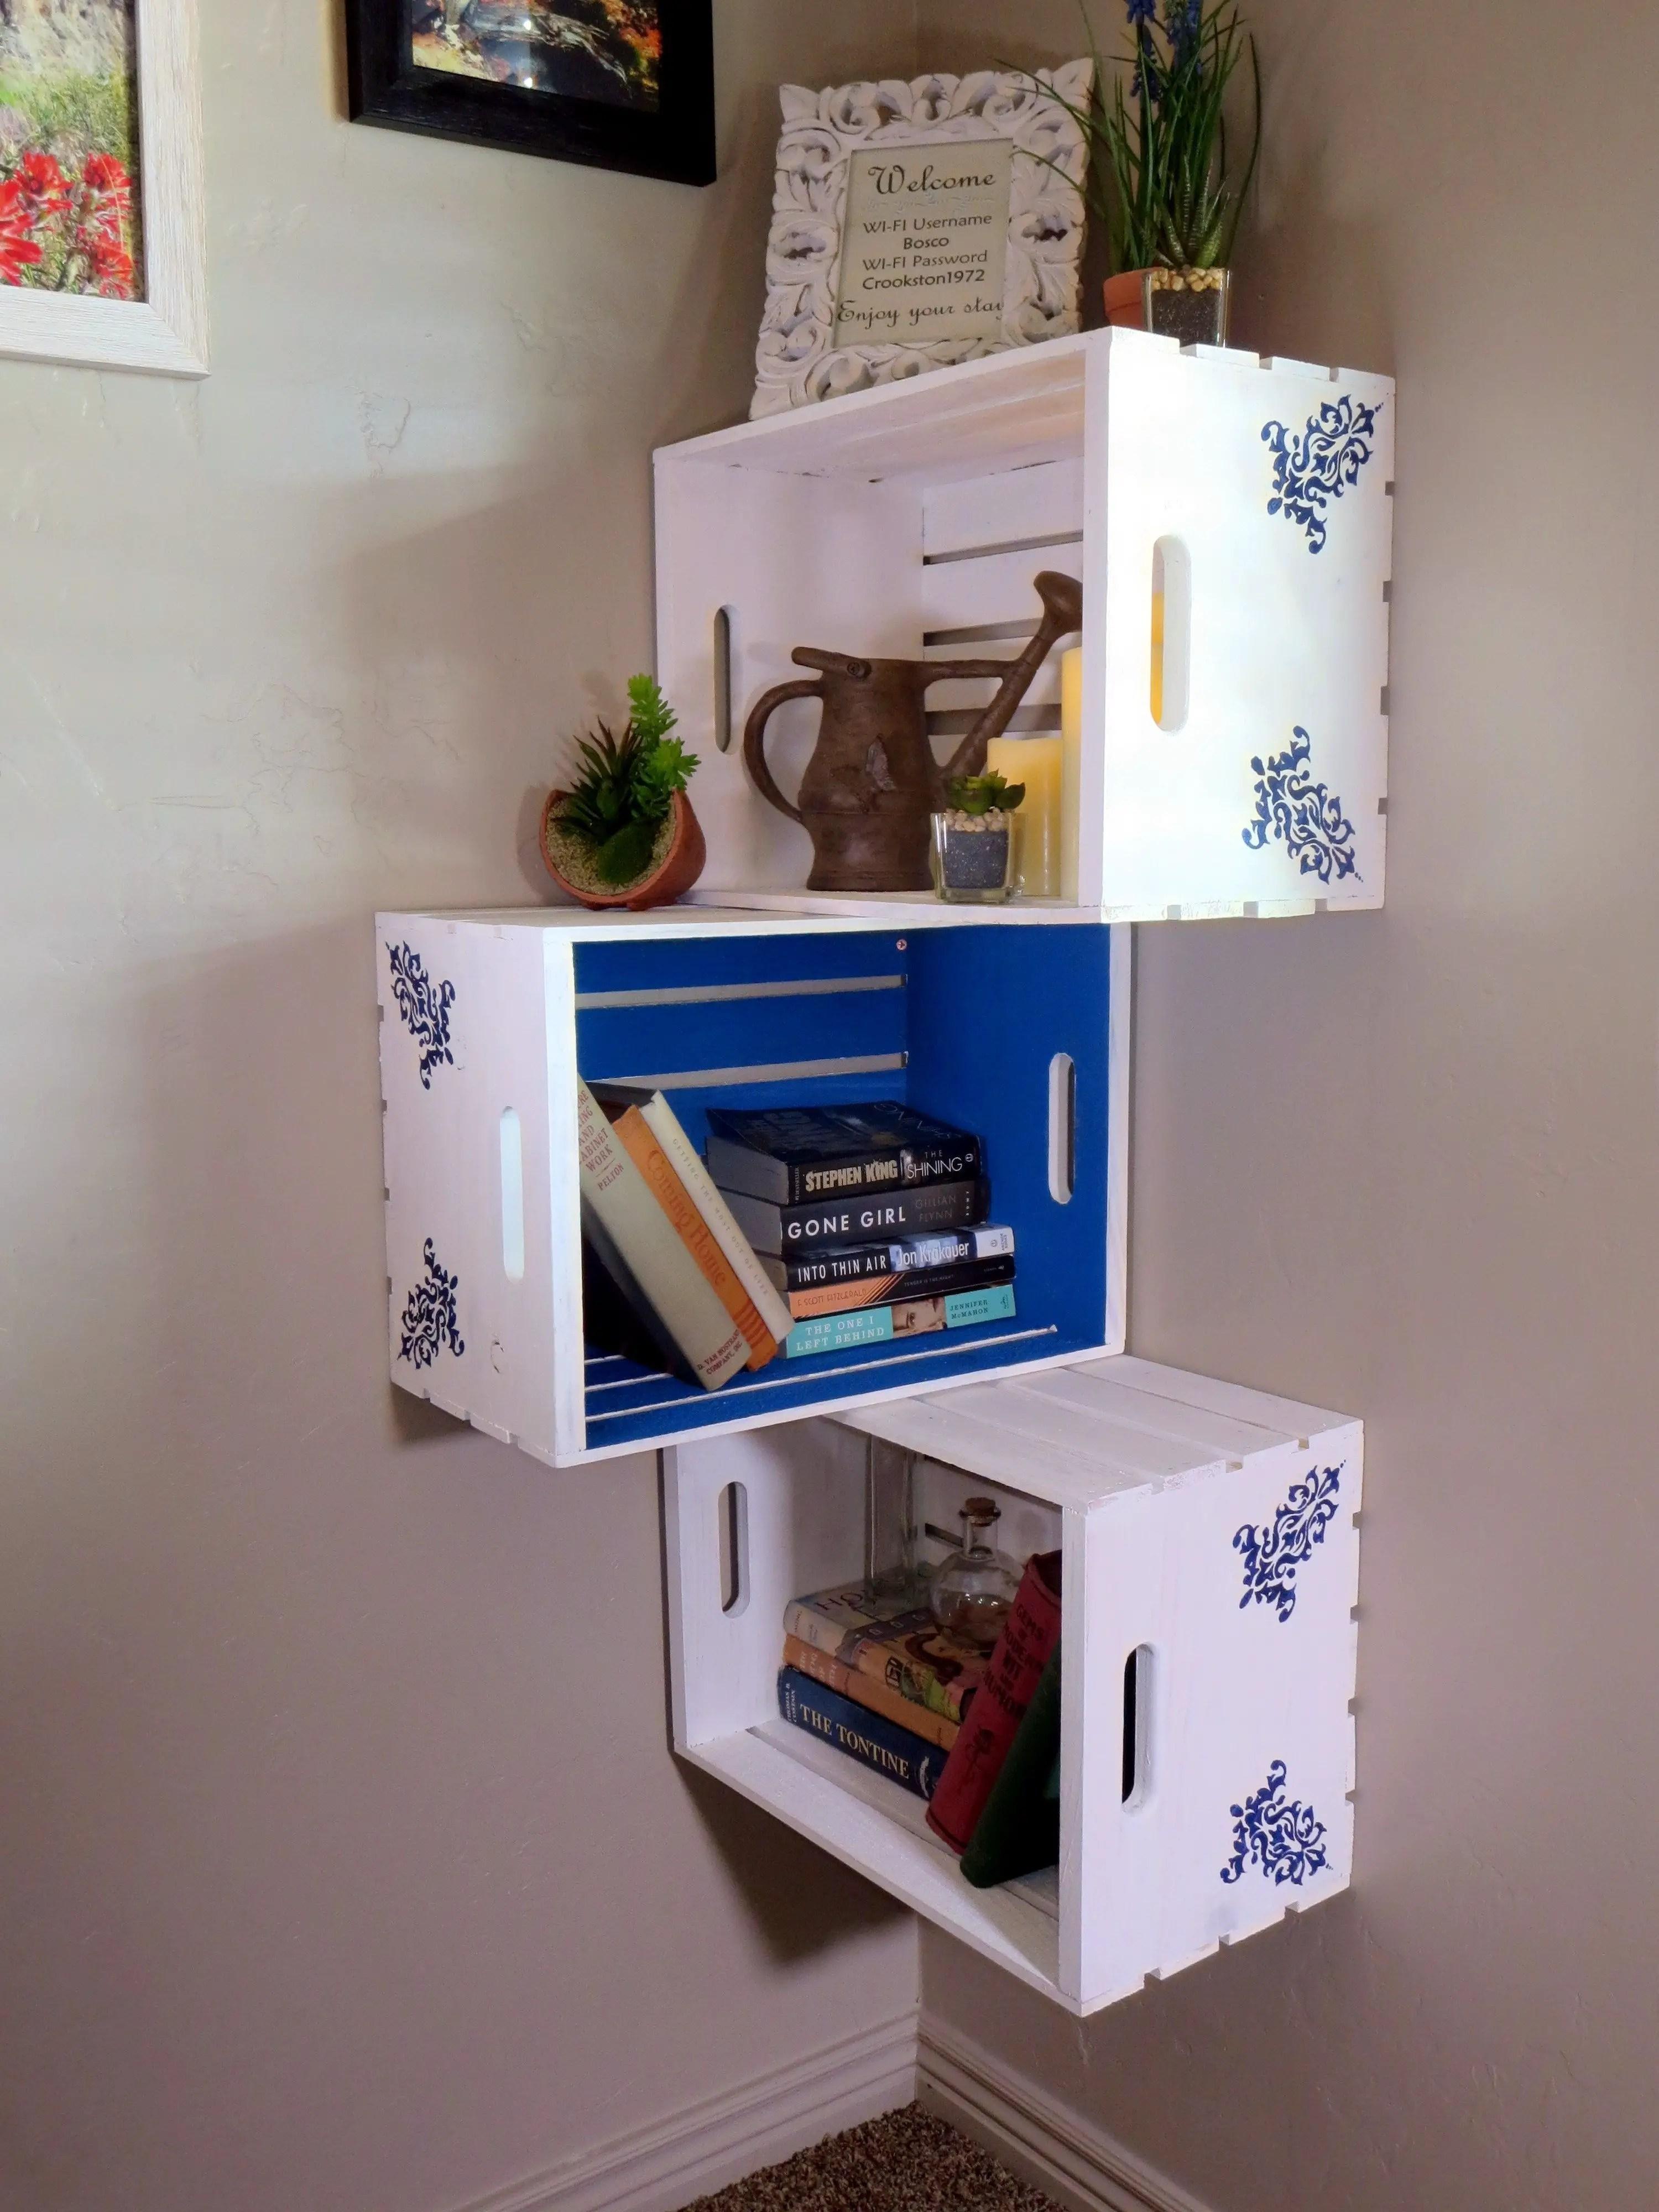 Genius corner storage ideas to upgrade your space 13